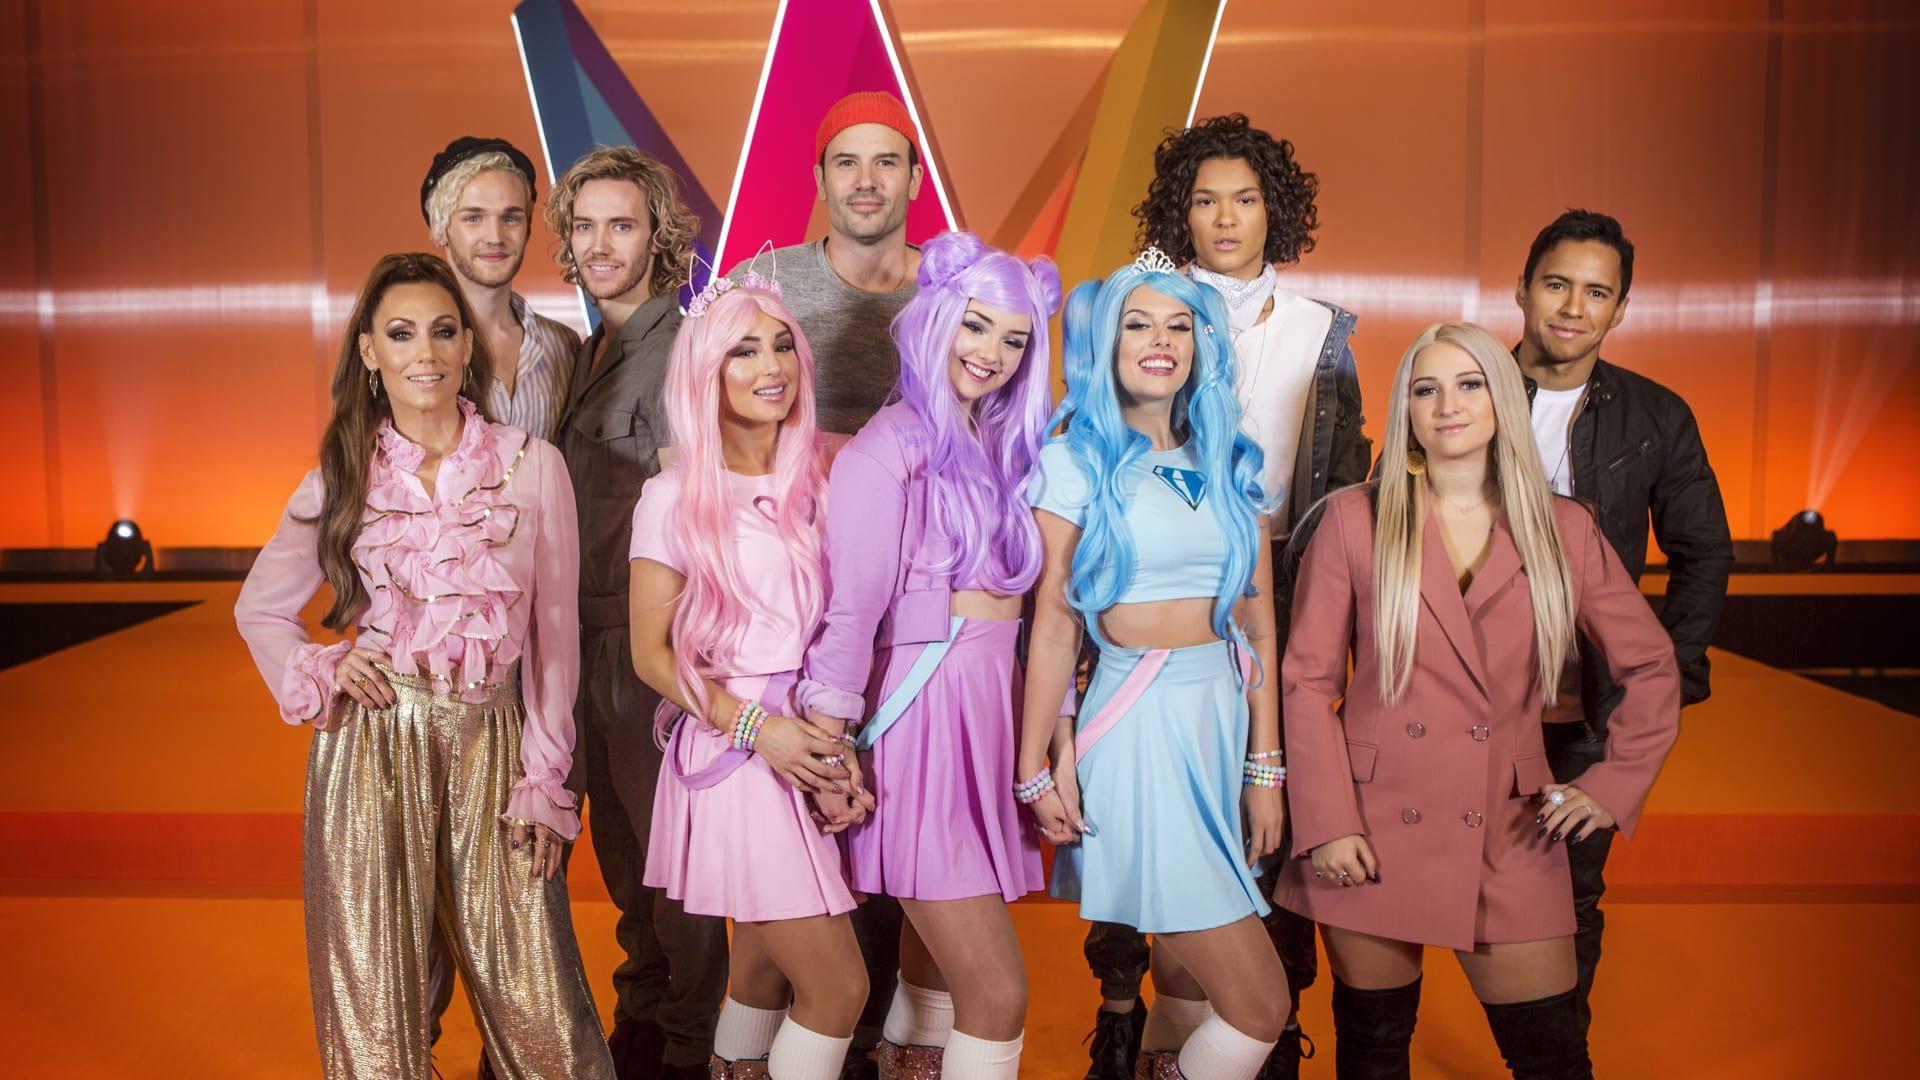 Melodifestivalen 2019 Deltävling 2: Melodifestivalen 2019: Deltävling 3